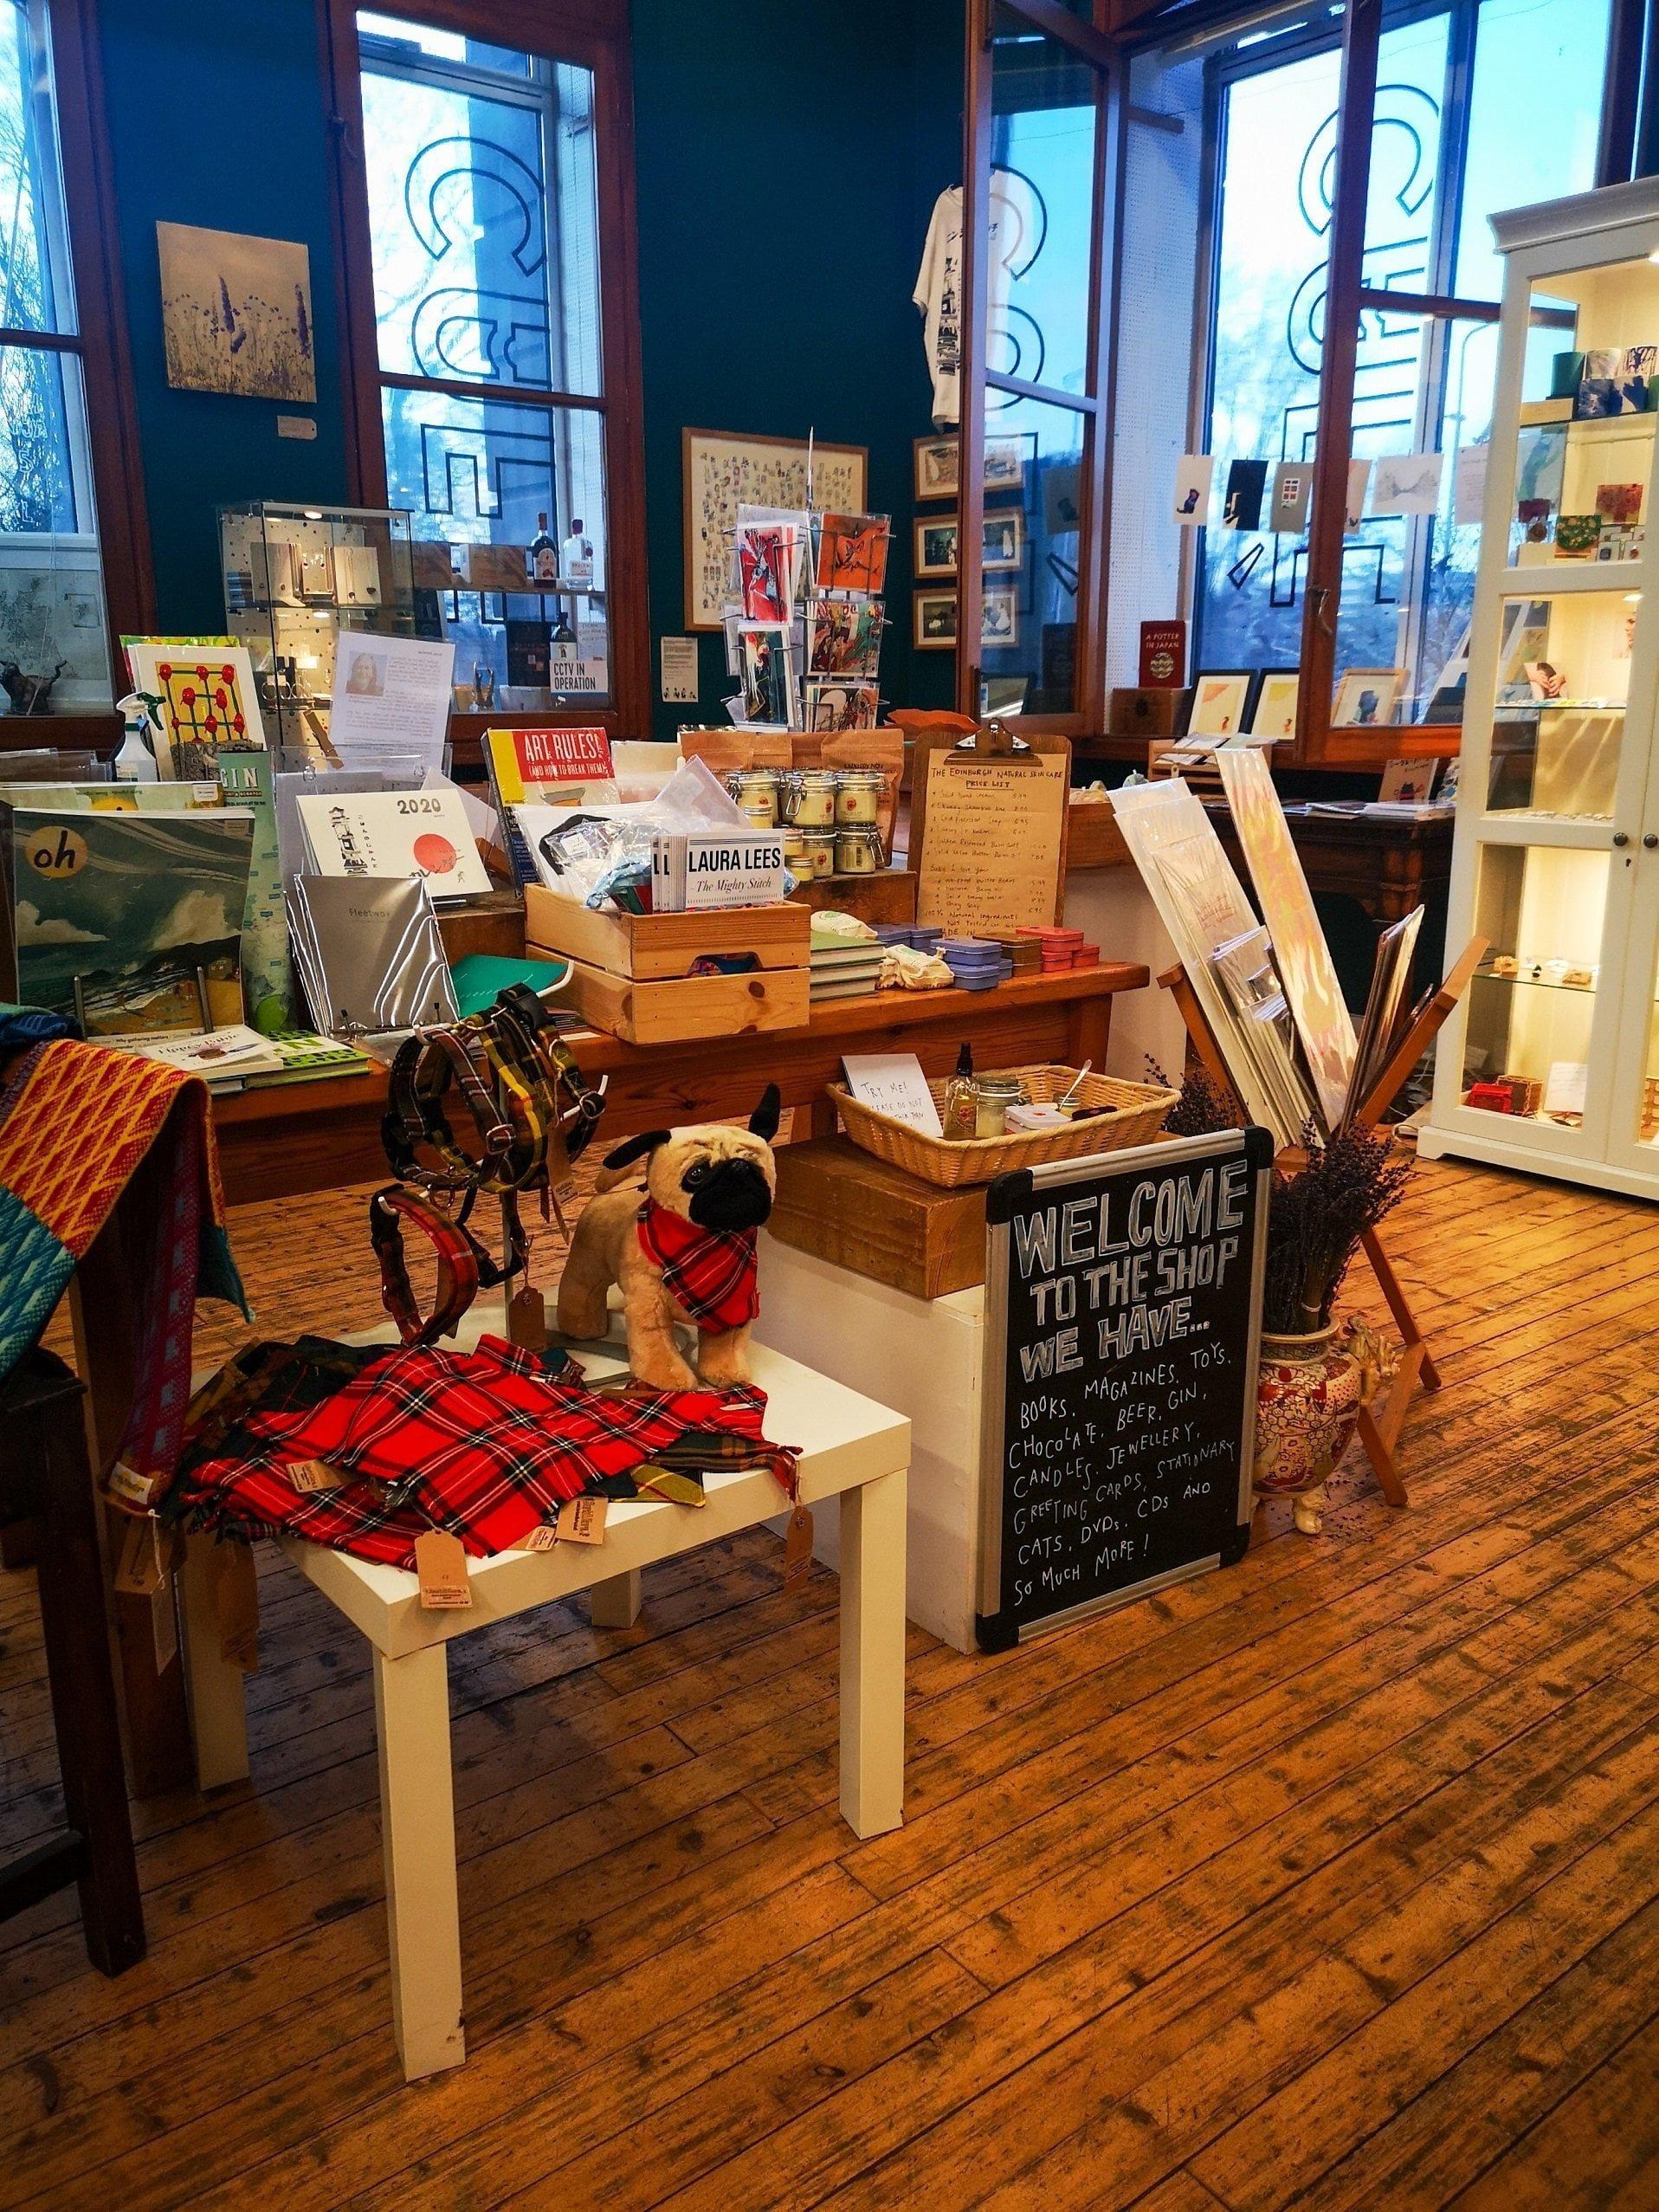 Summerhal shop interior, Sustainable Edinburgh Guide